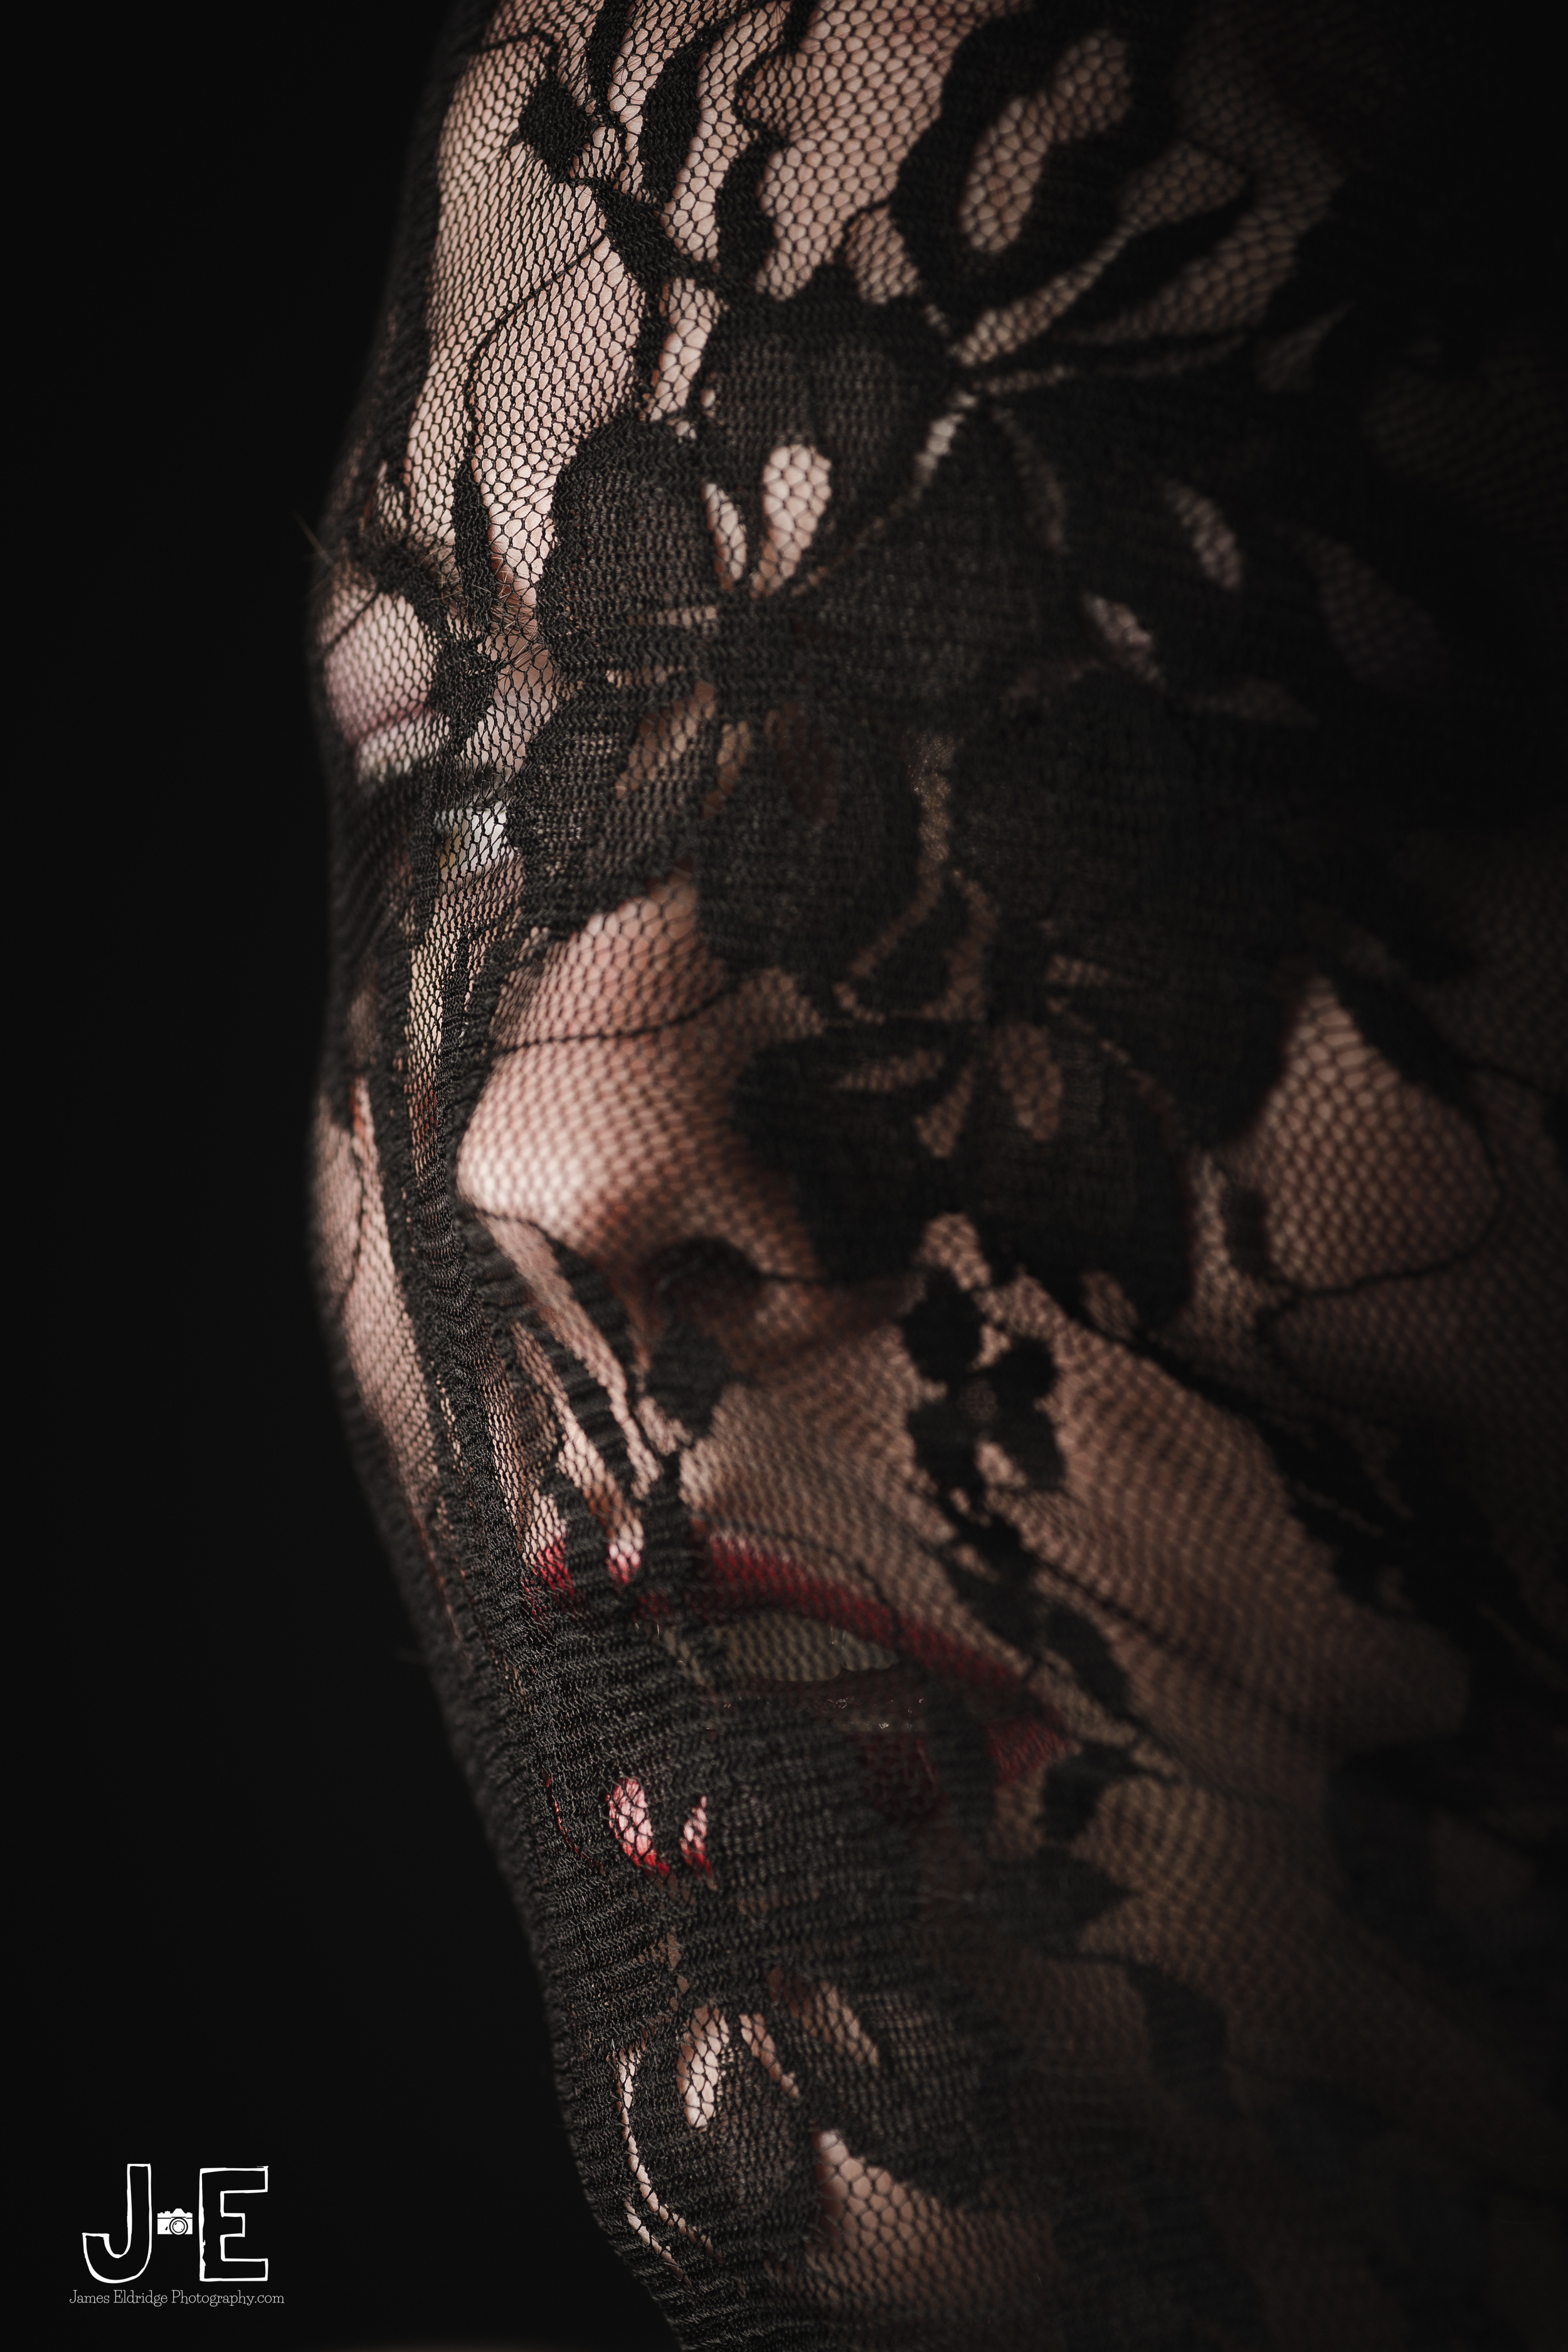 Beverly fabric photoshoot